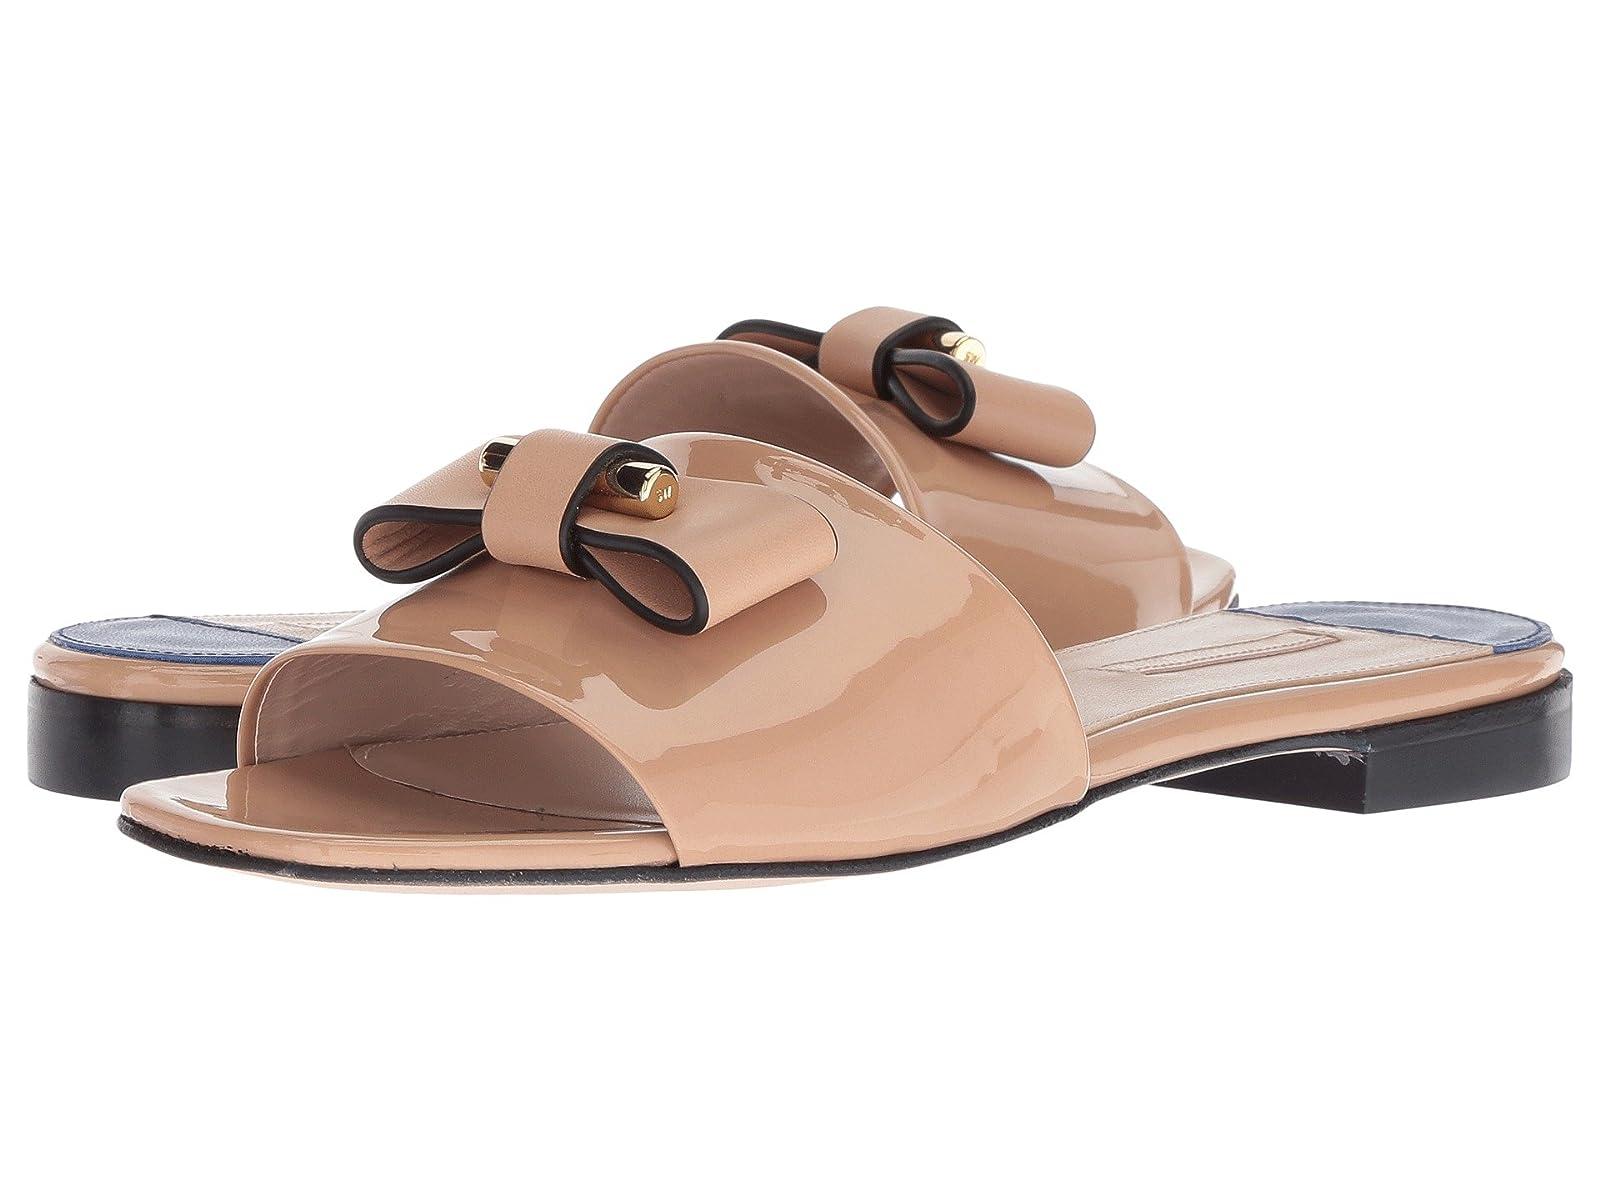 Stuart Weitzman Belle SlideAtmospheric grades have affordable shoes